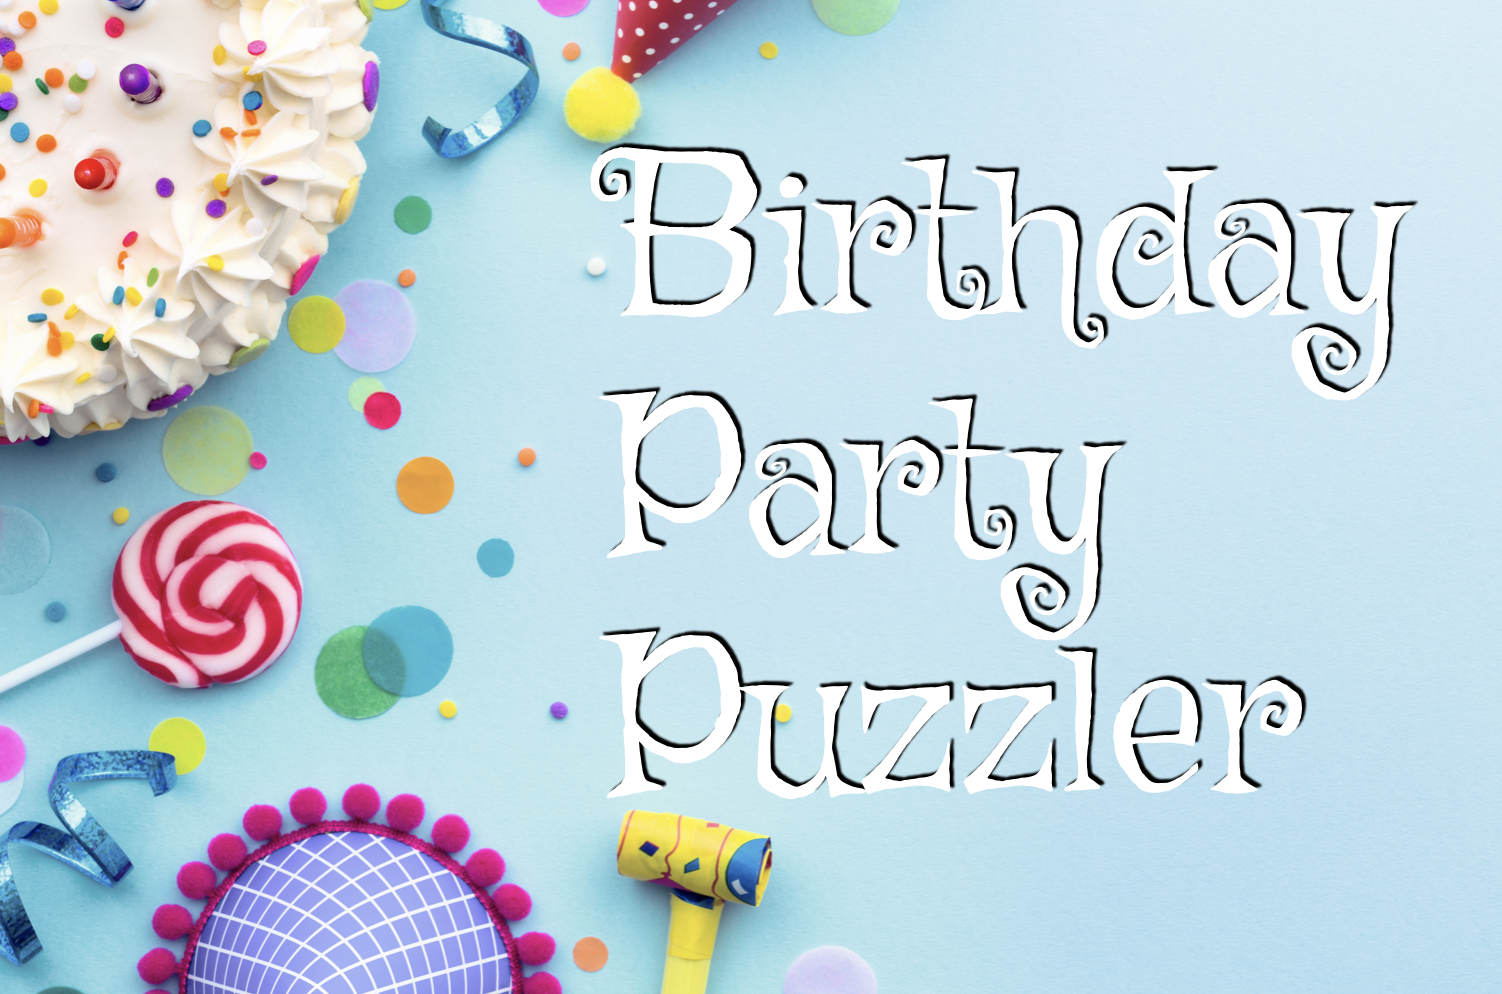 BIRTHDAY PARTY PUZZLER